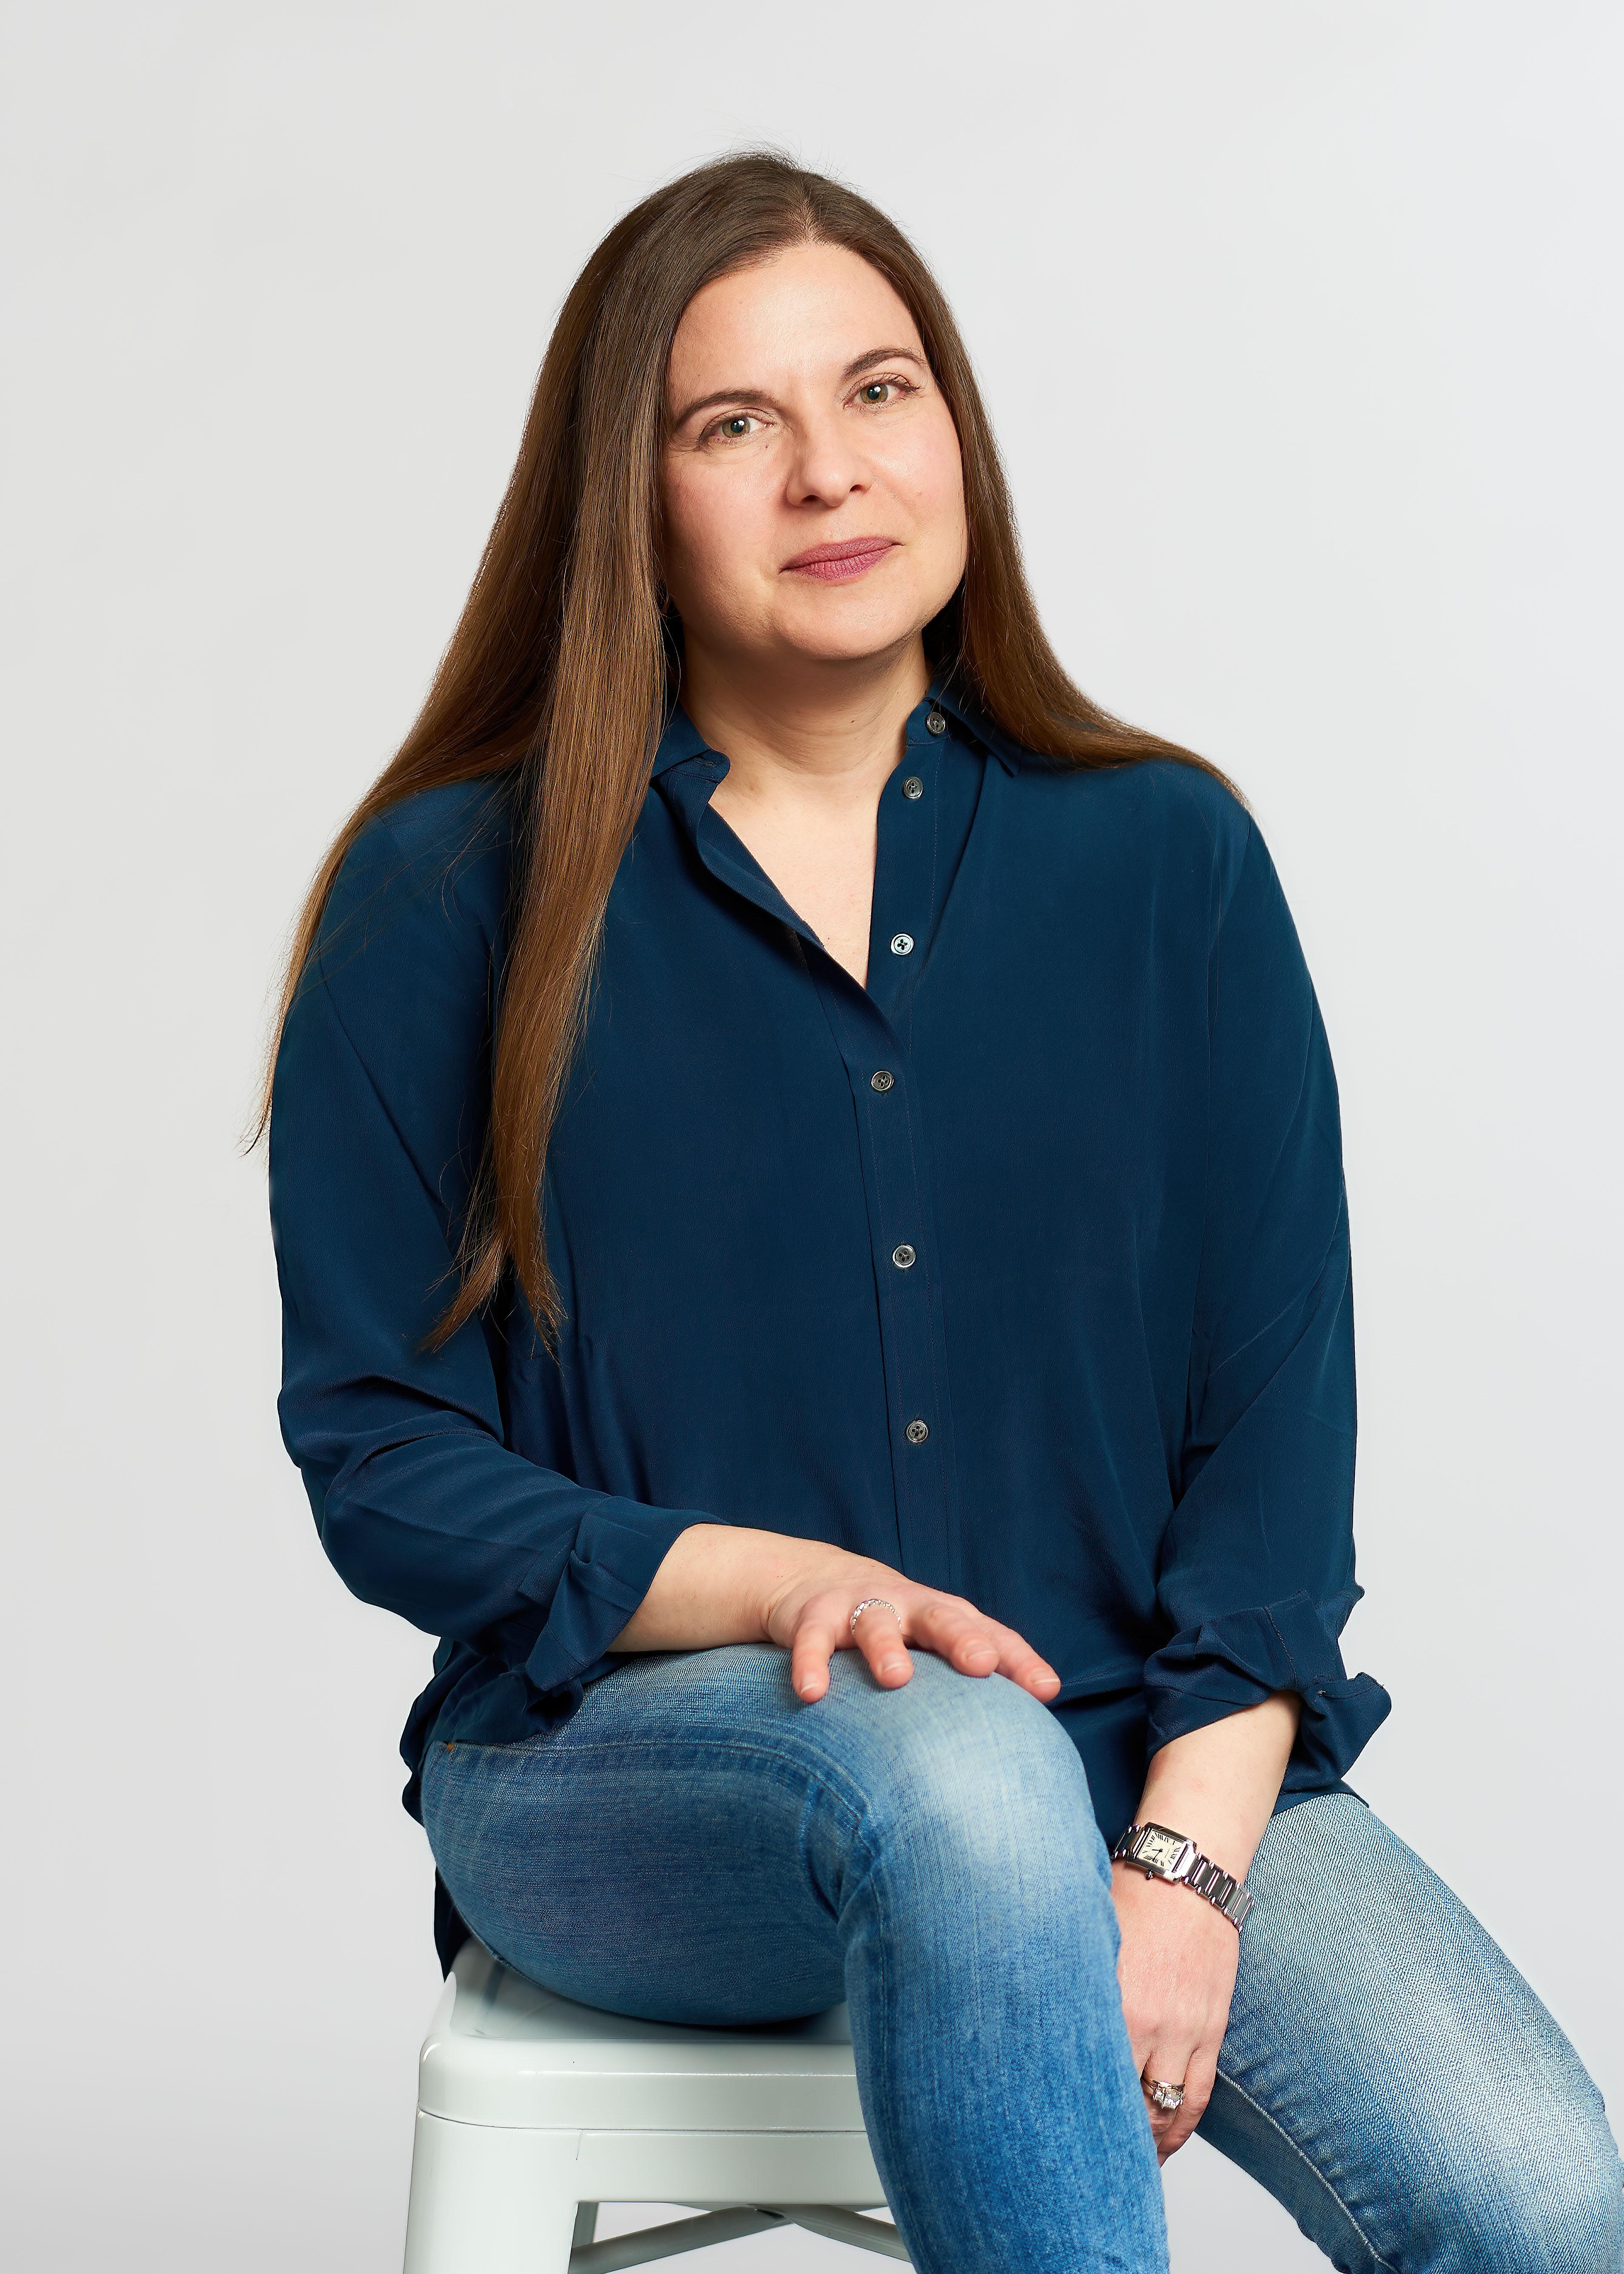 Erin Zipes